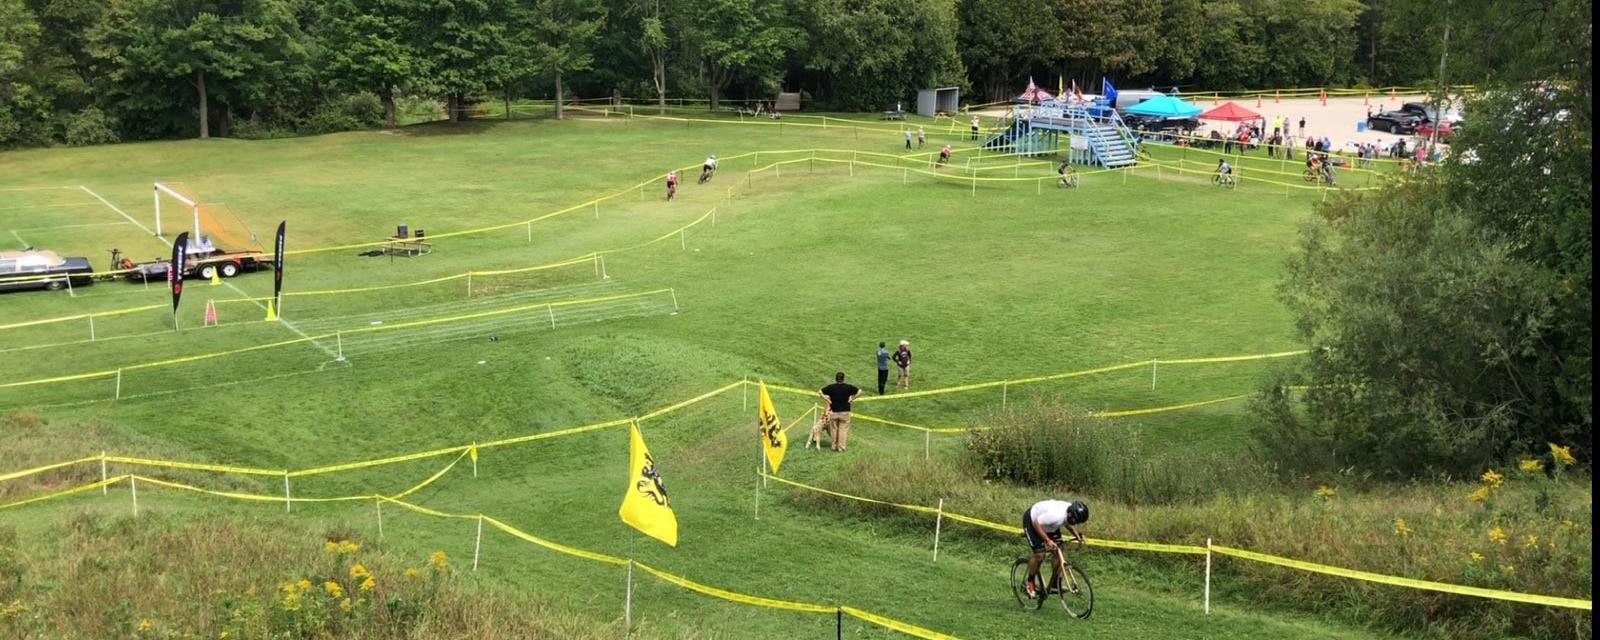 Heavy Pedal Velo Club and Broken Spoke Bikes